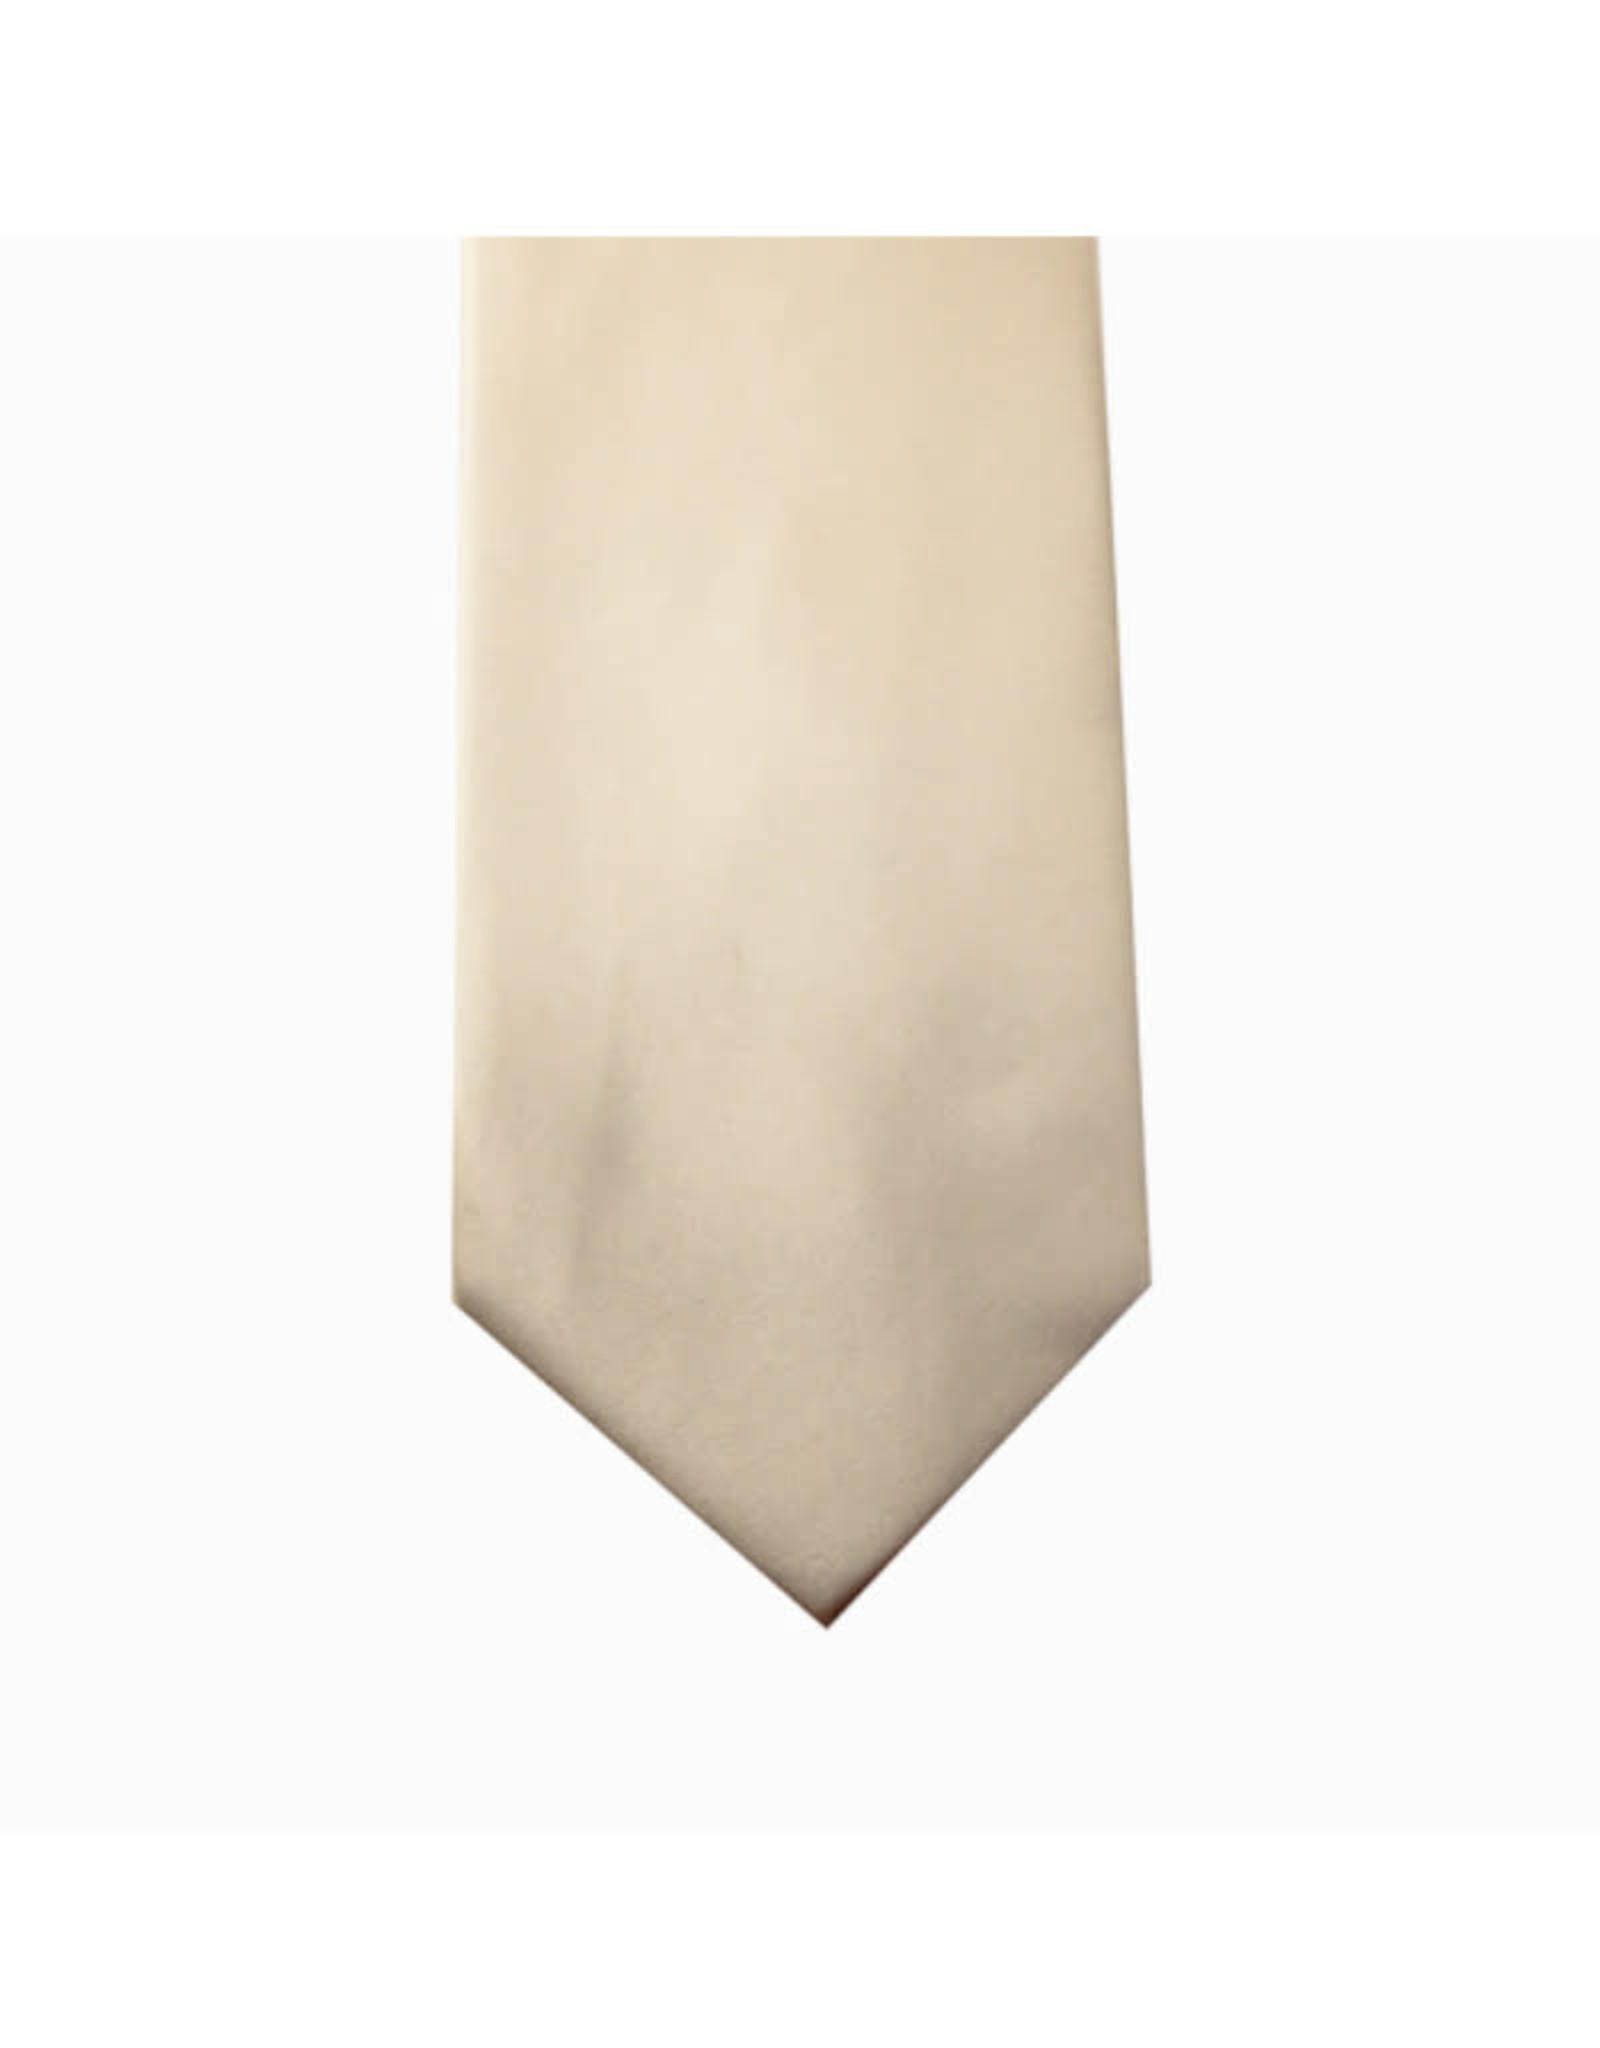 Knotz M100 Solid Tie 31-40